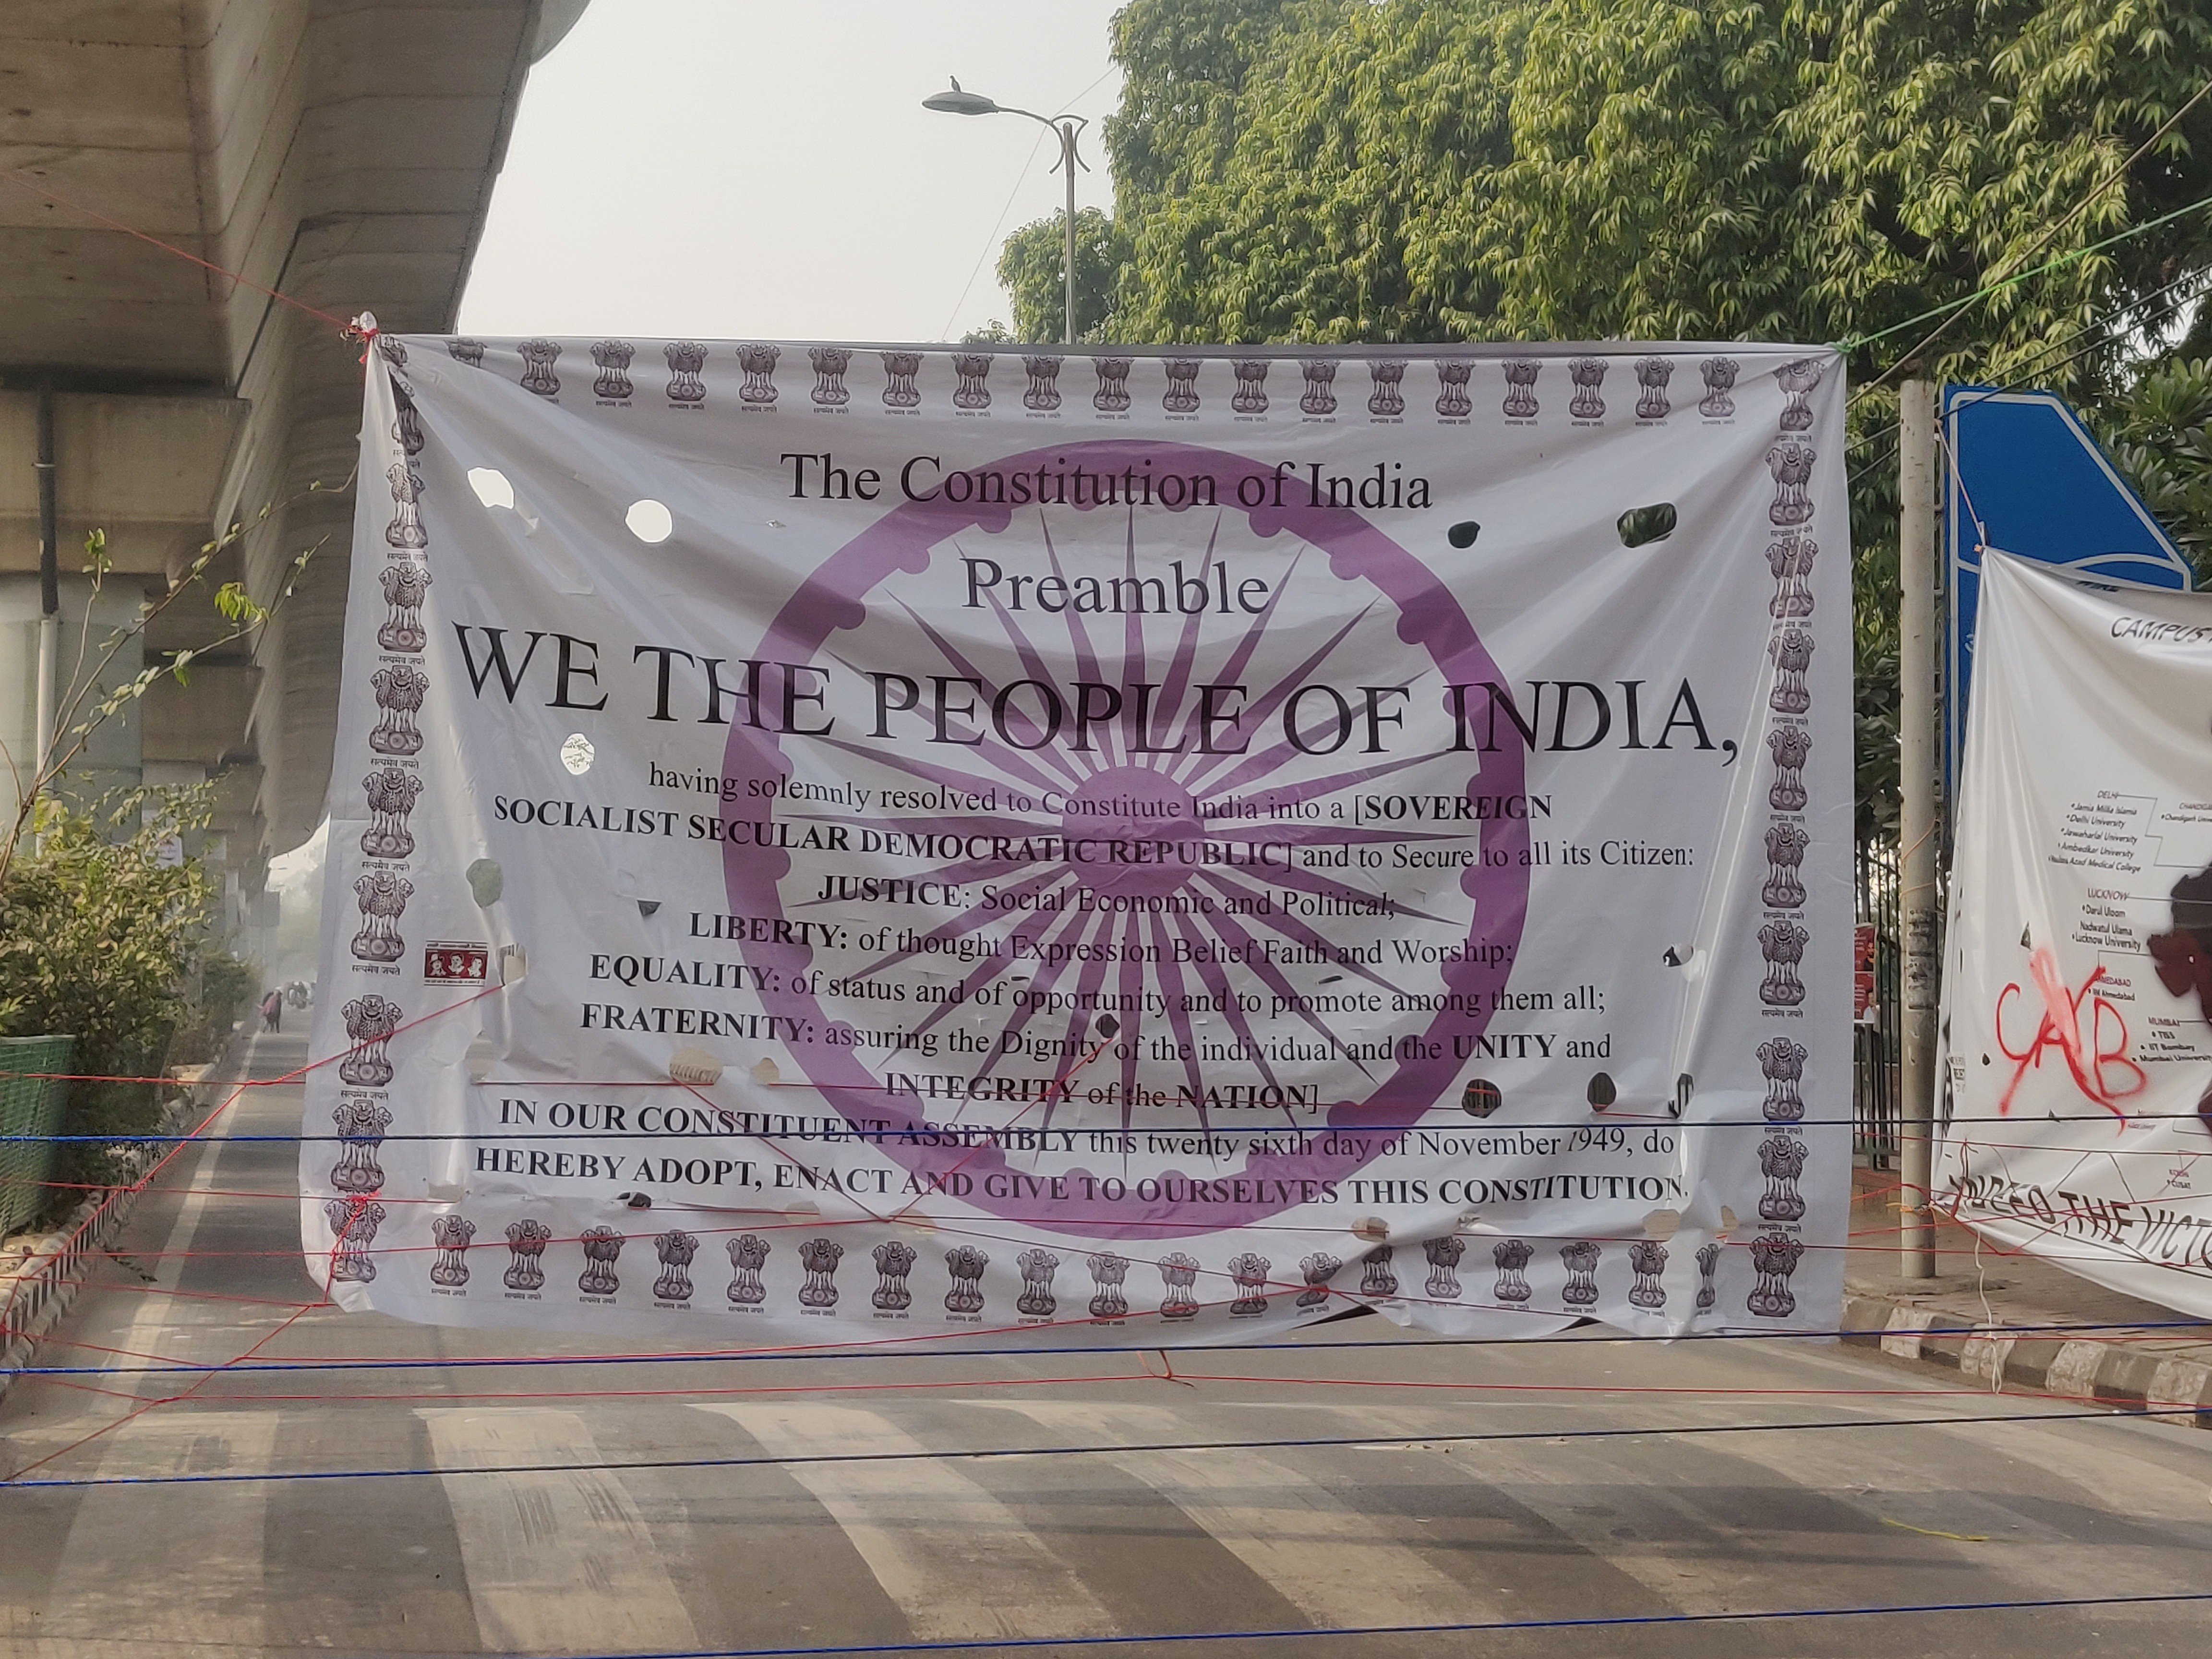 Poster at the anti-CAA rallying point in Jamia Millia Islamia, Delhi, India, 2020 | J-T.M.